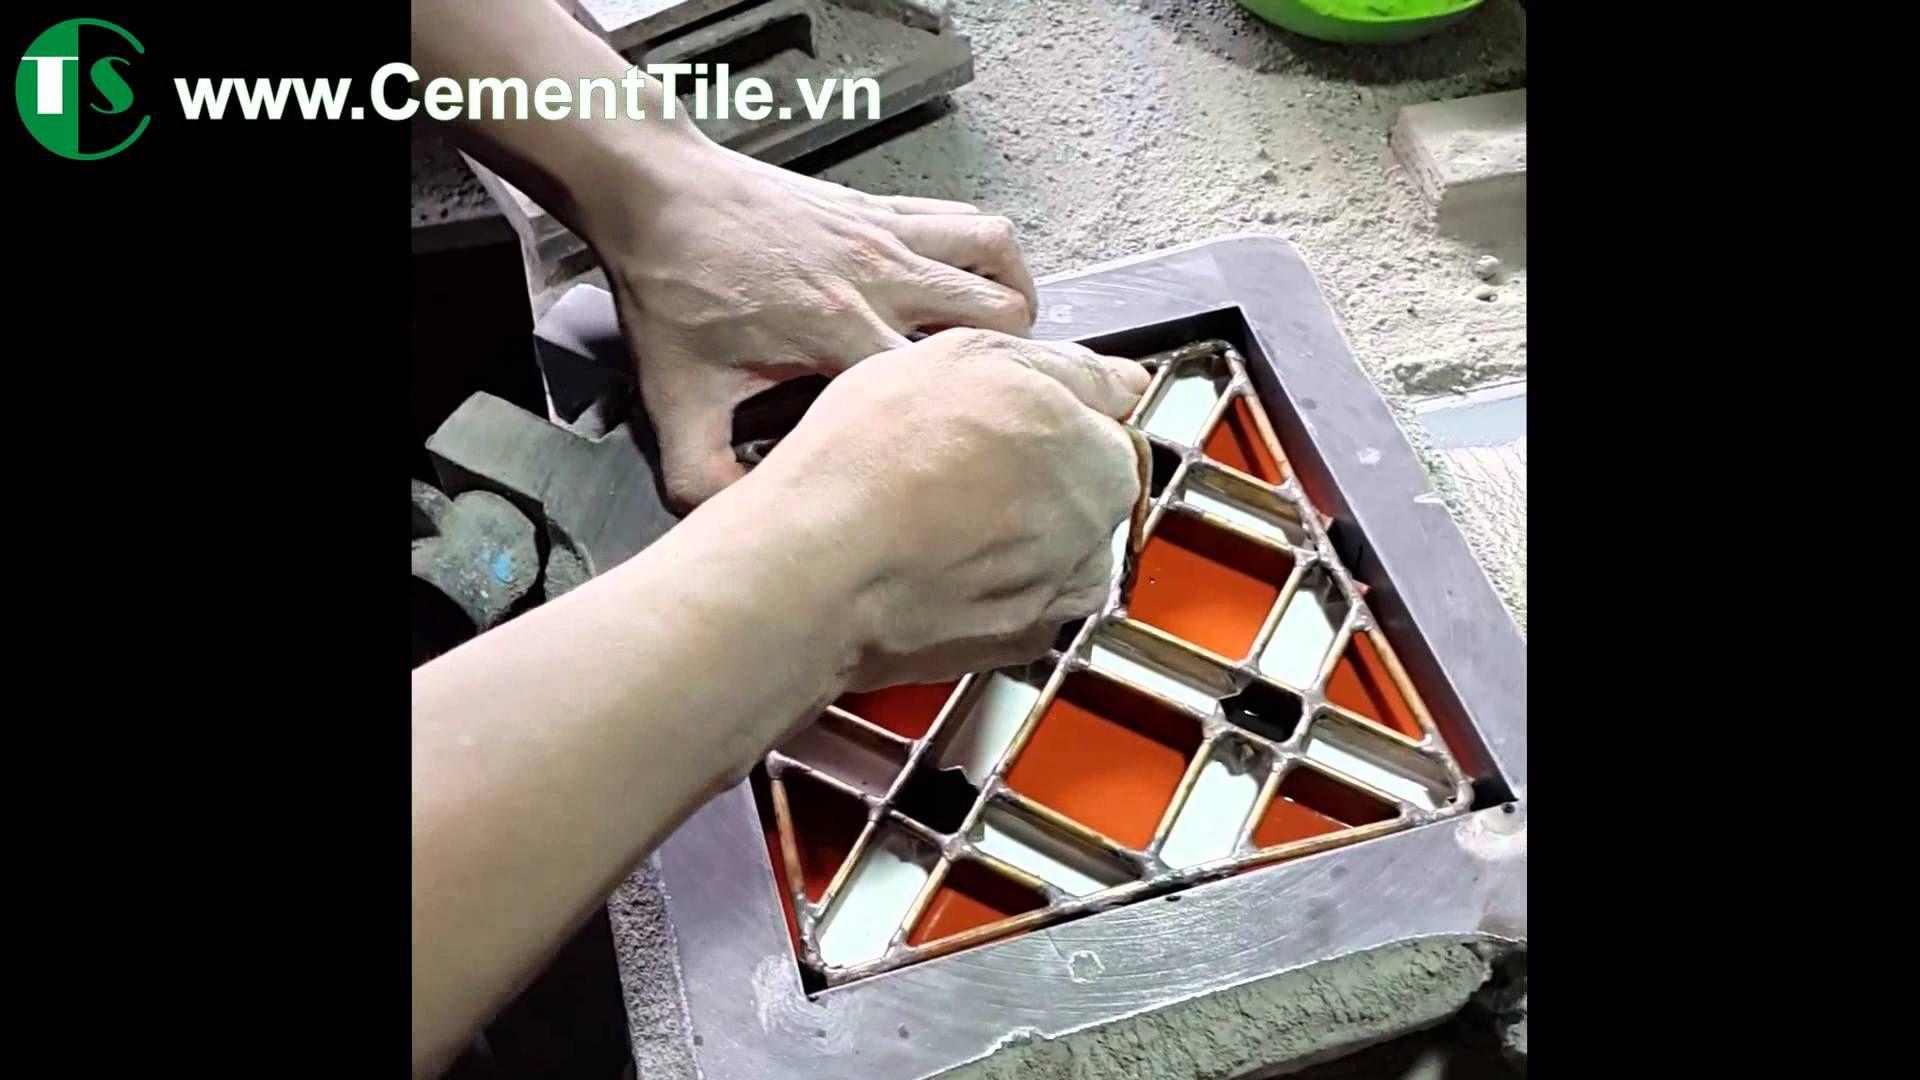 How to make an encautics tile handmade and nonburn